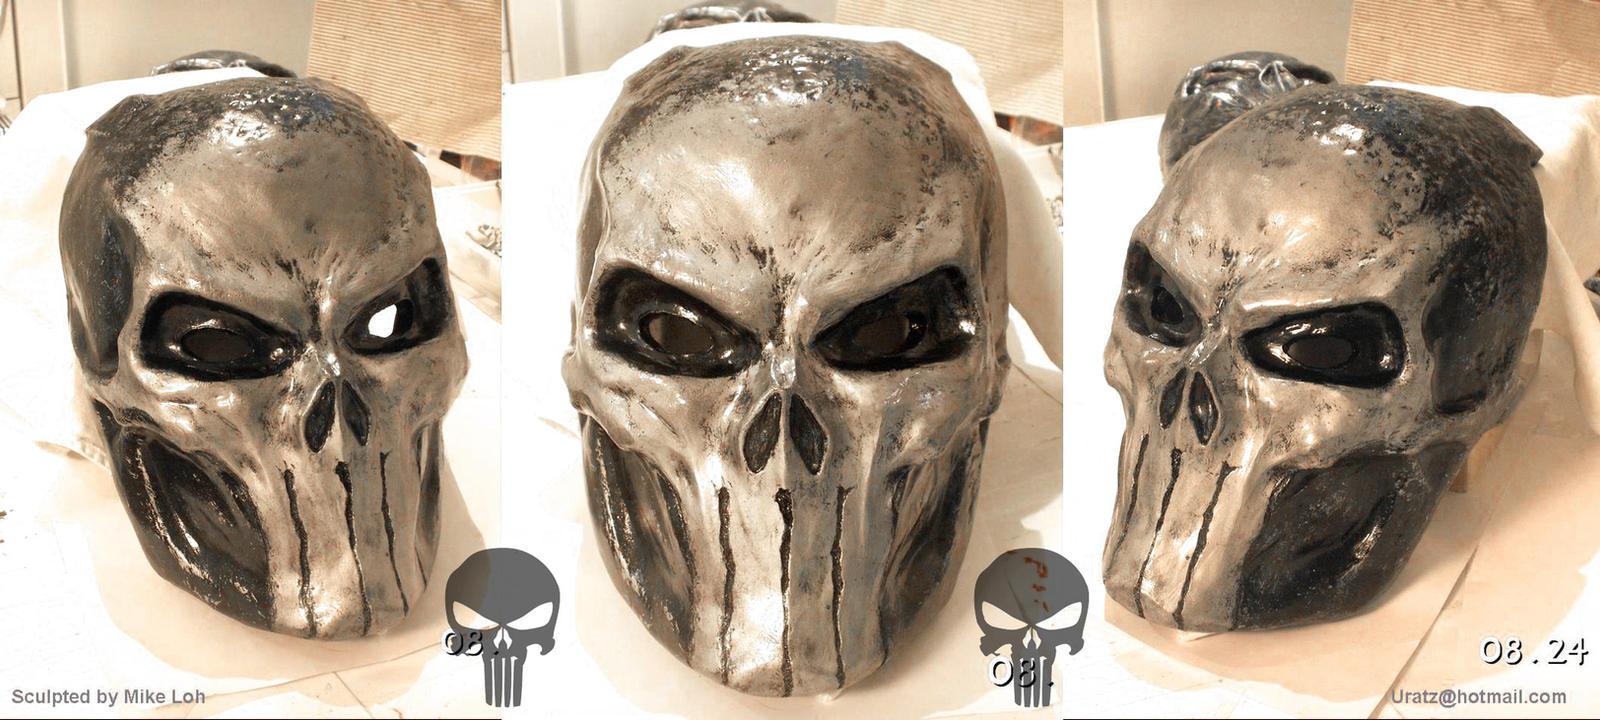 Punisher skull mask clean by uratz studios on deviantart - Uratz studios ...